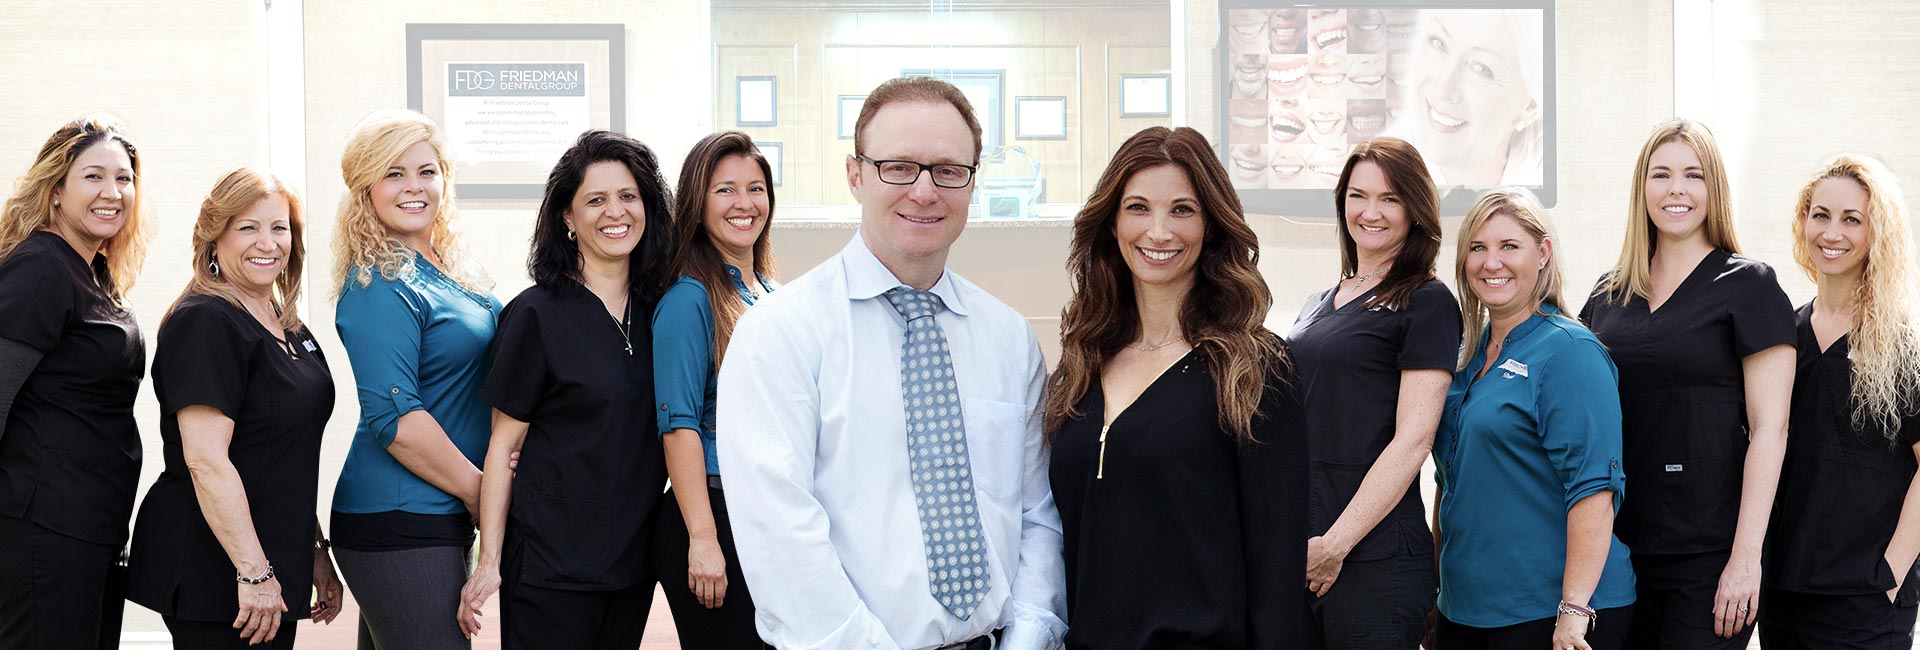 Dr Friedman Dental Group Team - Teeth in a Day Florida